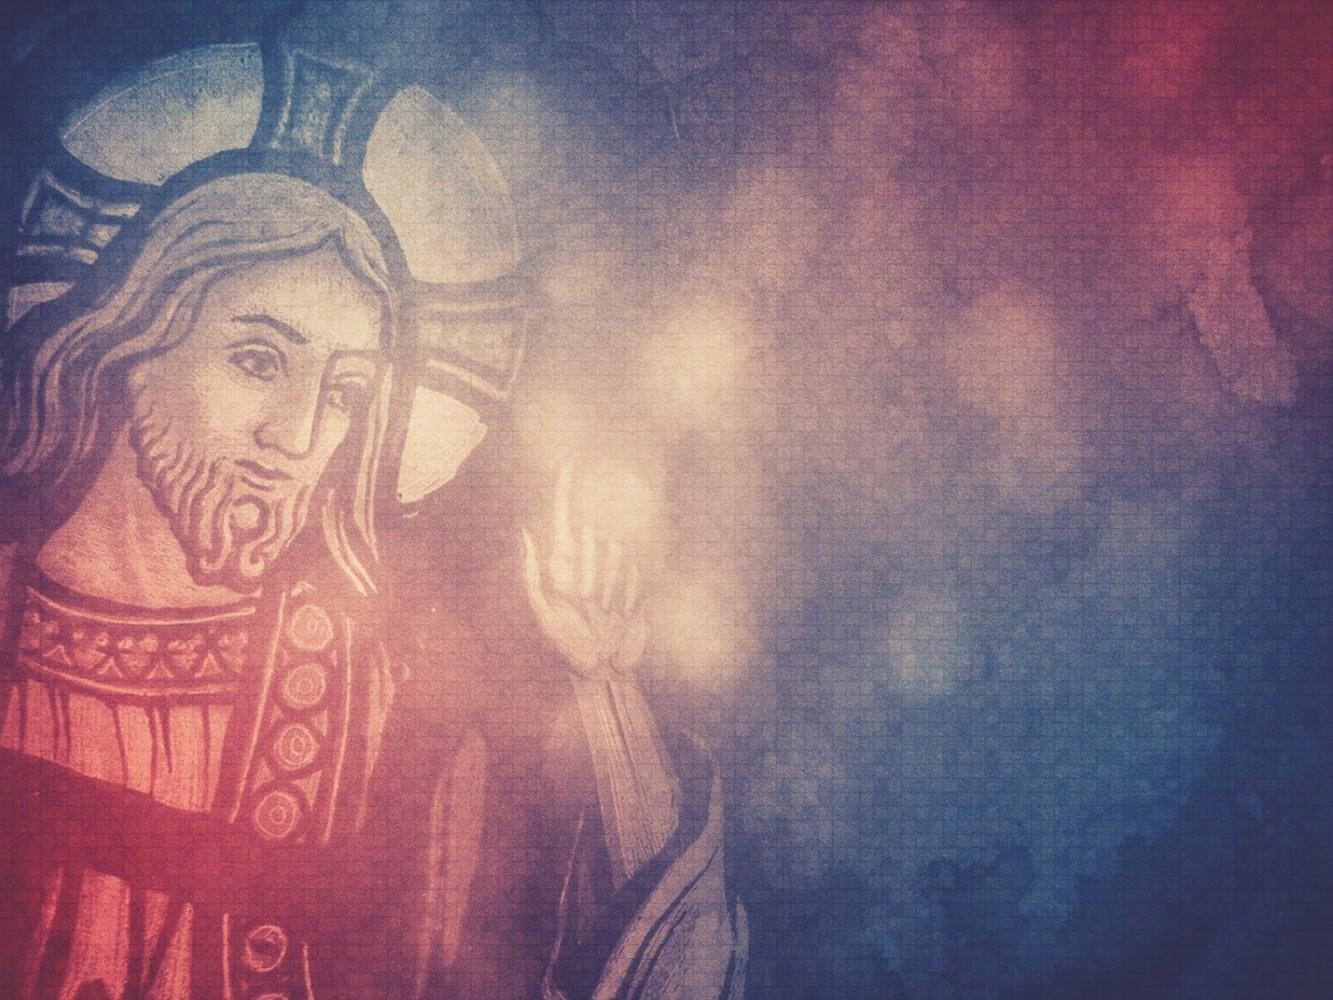 THE RAGMAN, THE CHRIST